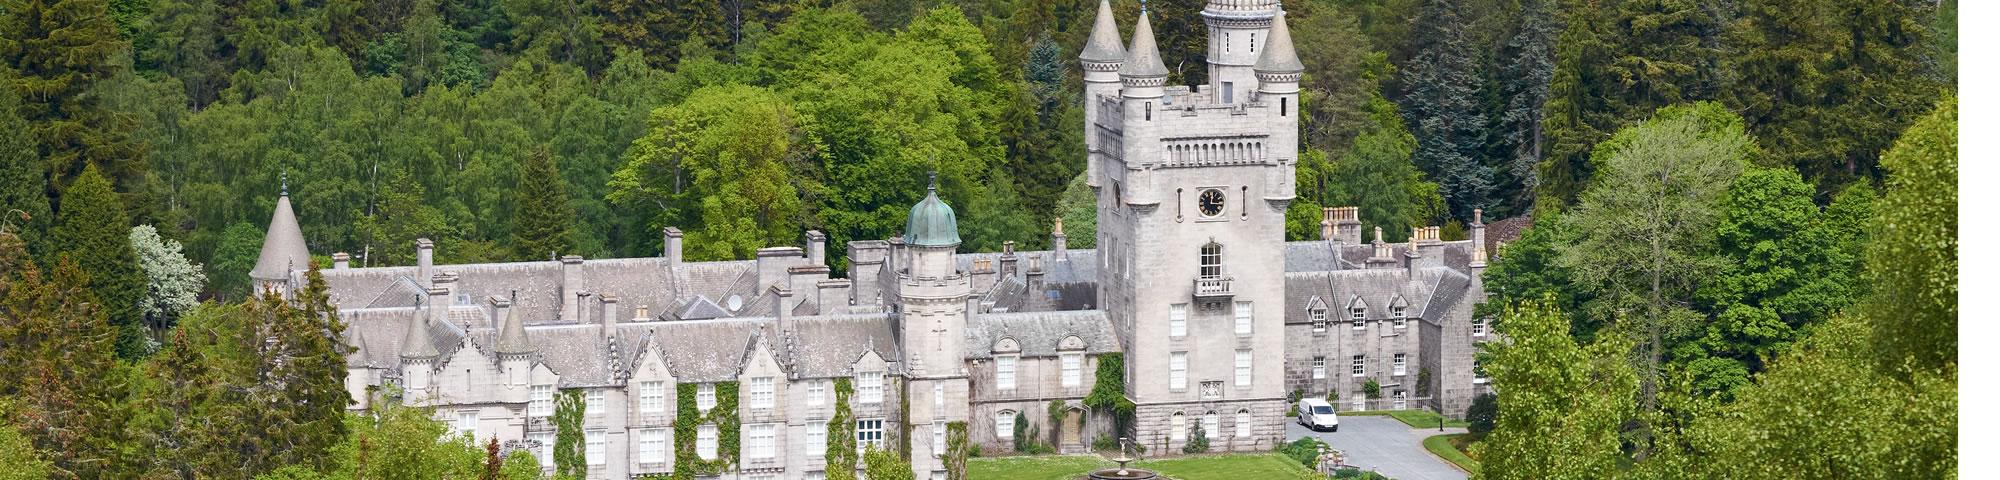 Balmoral Castle Estate, Aberdeenshire